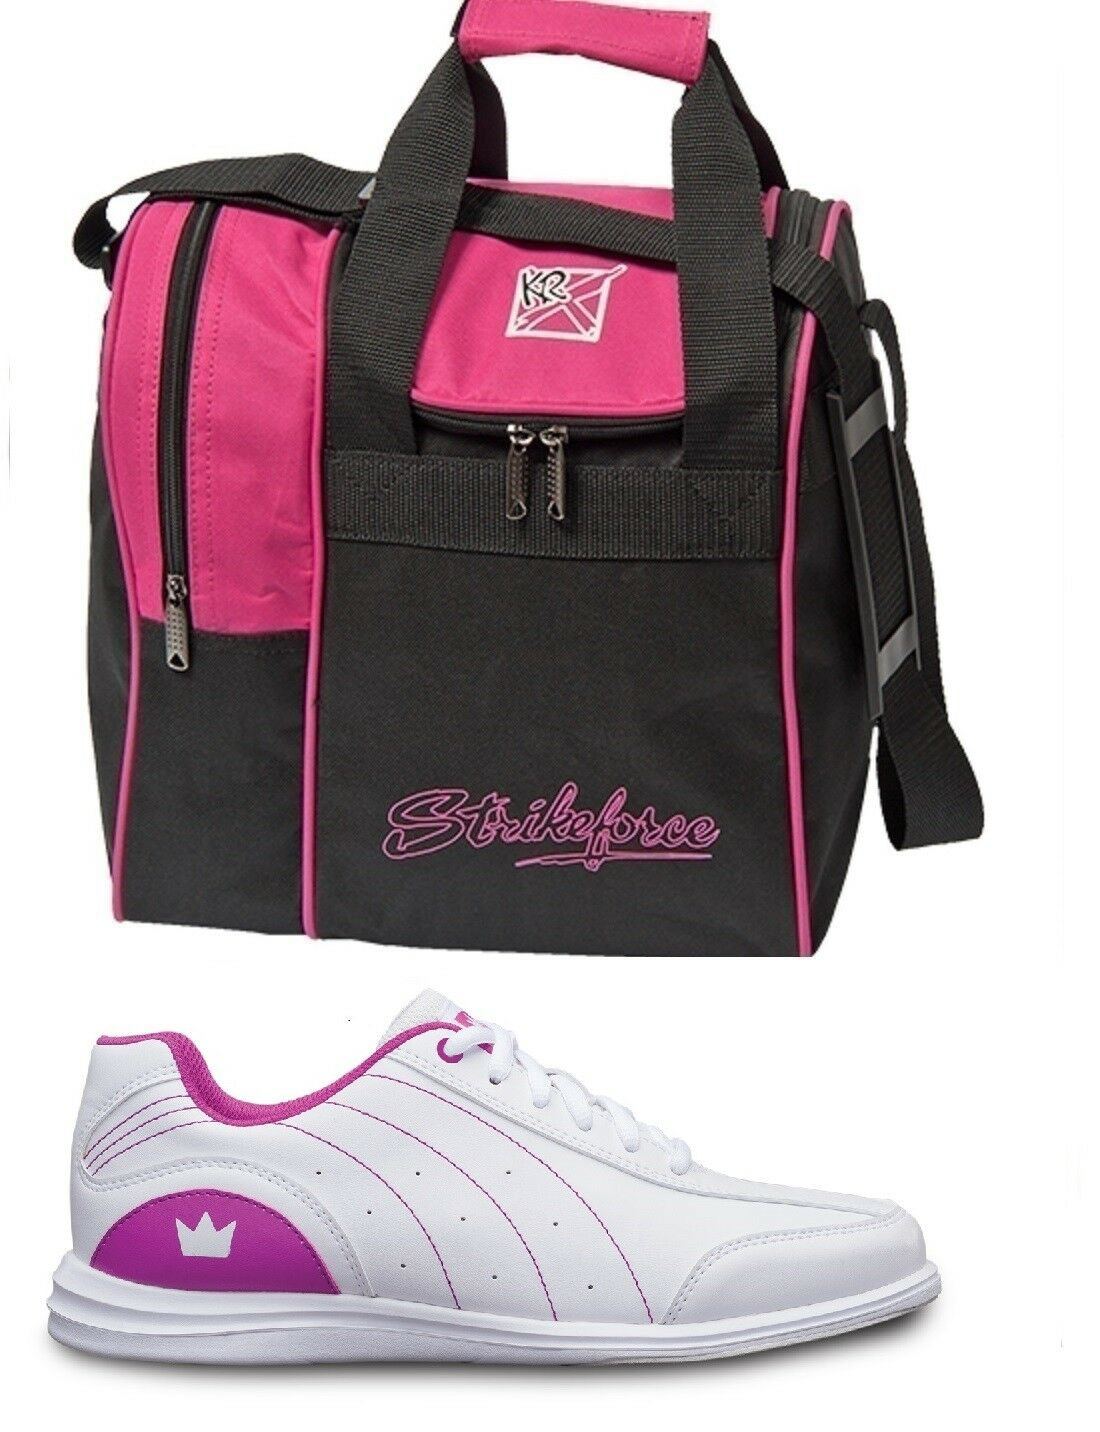 Girls MYSTIC Bowling Ball shoes White Fuchsia Sizes 1-6 & Pink 1 Ball Bag